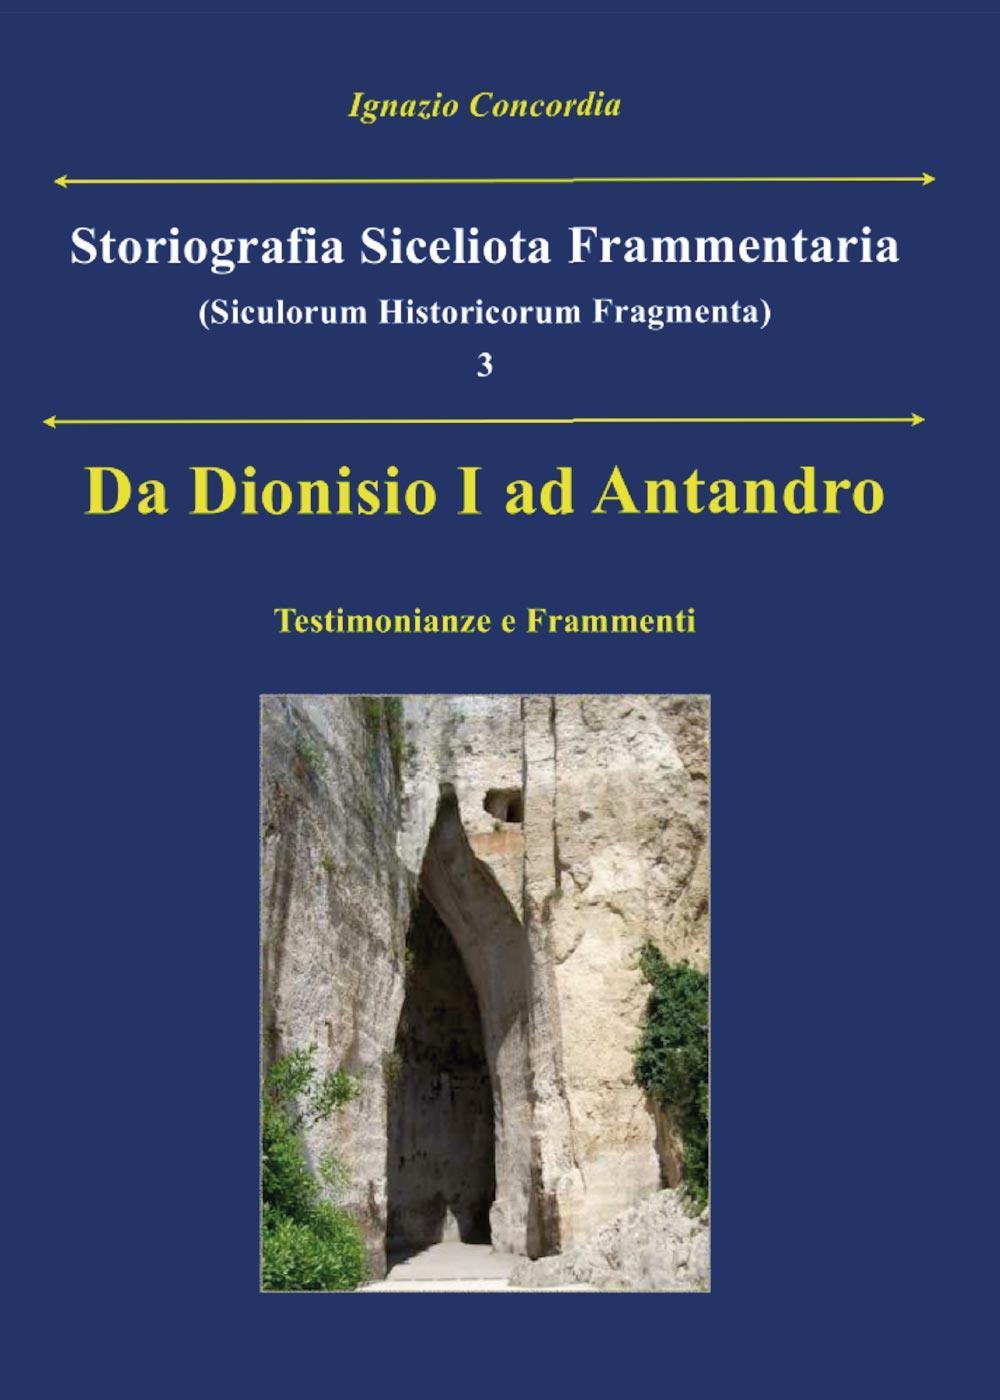 Da Dionisio I ad Antandro. Storiografia Siceliota Frammentaria 3